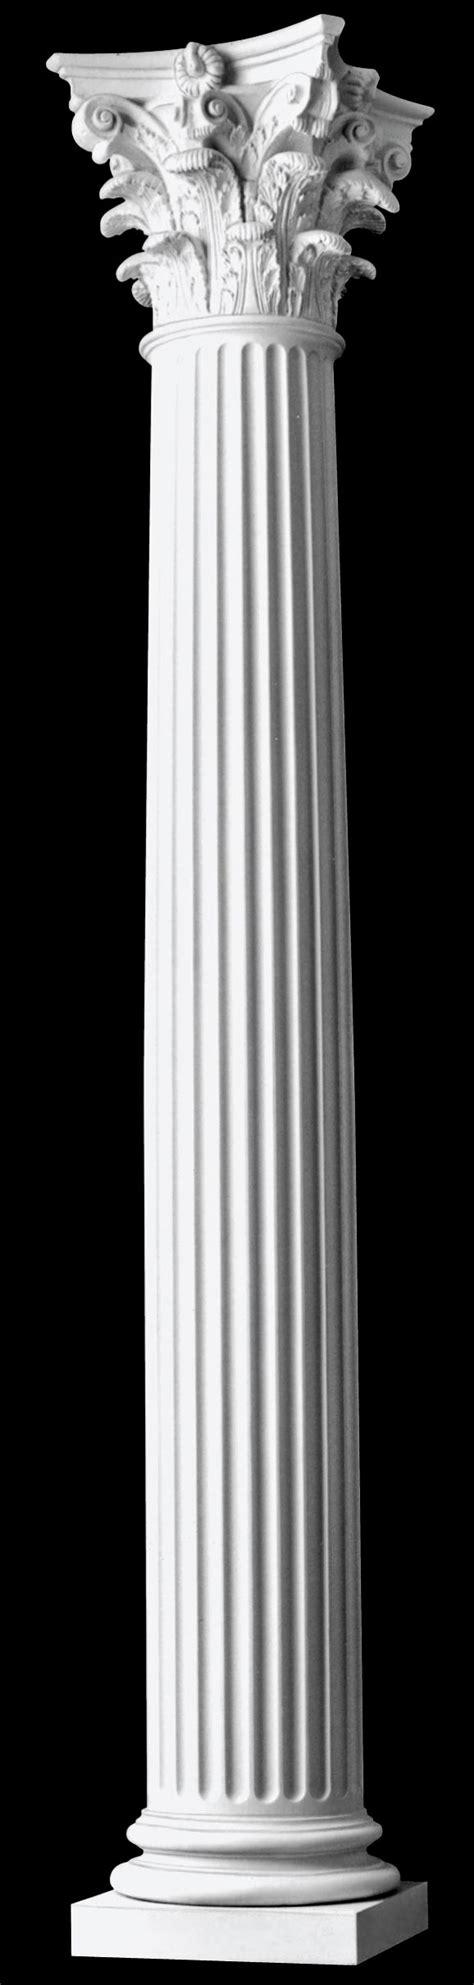 architectural columns fluted corinthian wood columns